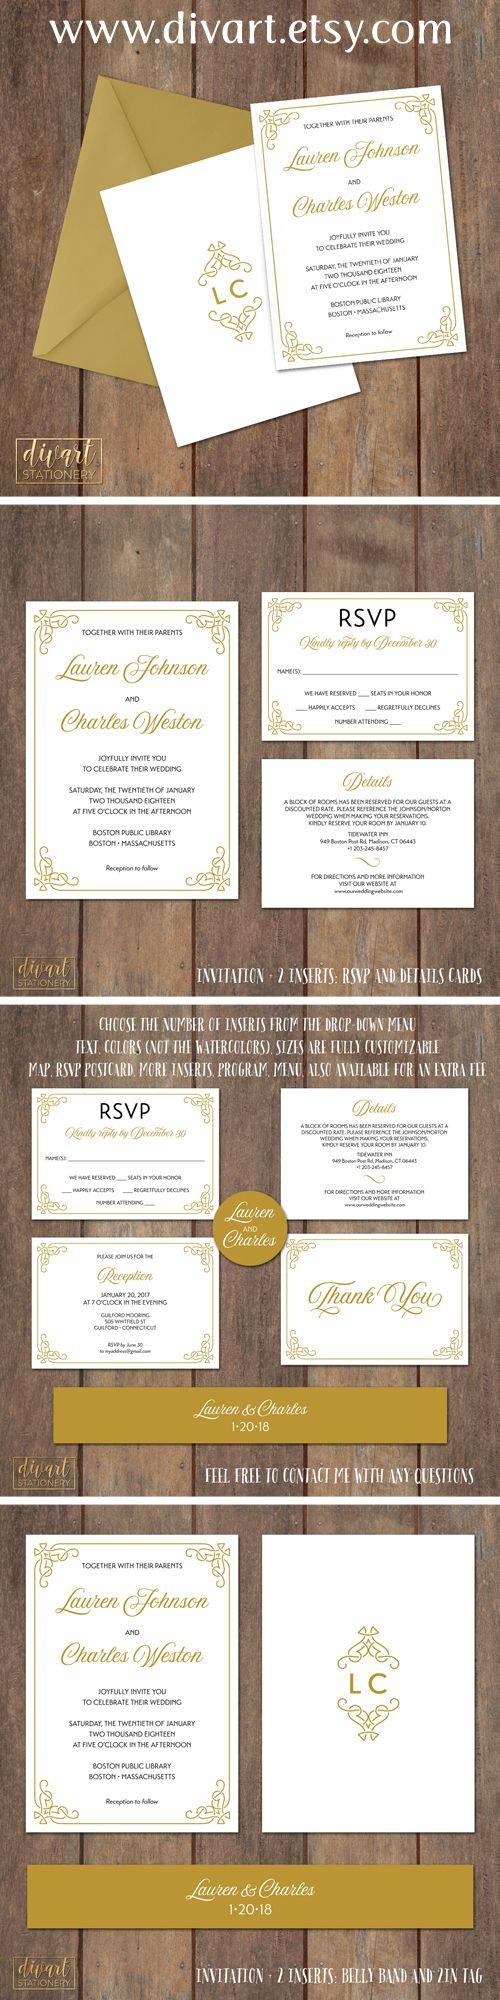 Best 25 Print invitations online ideas on Pinterest